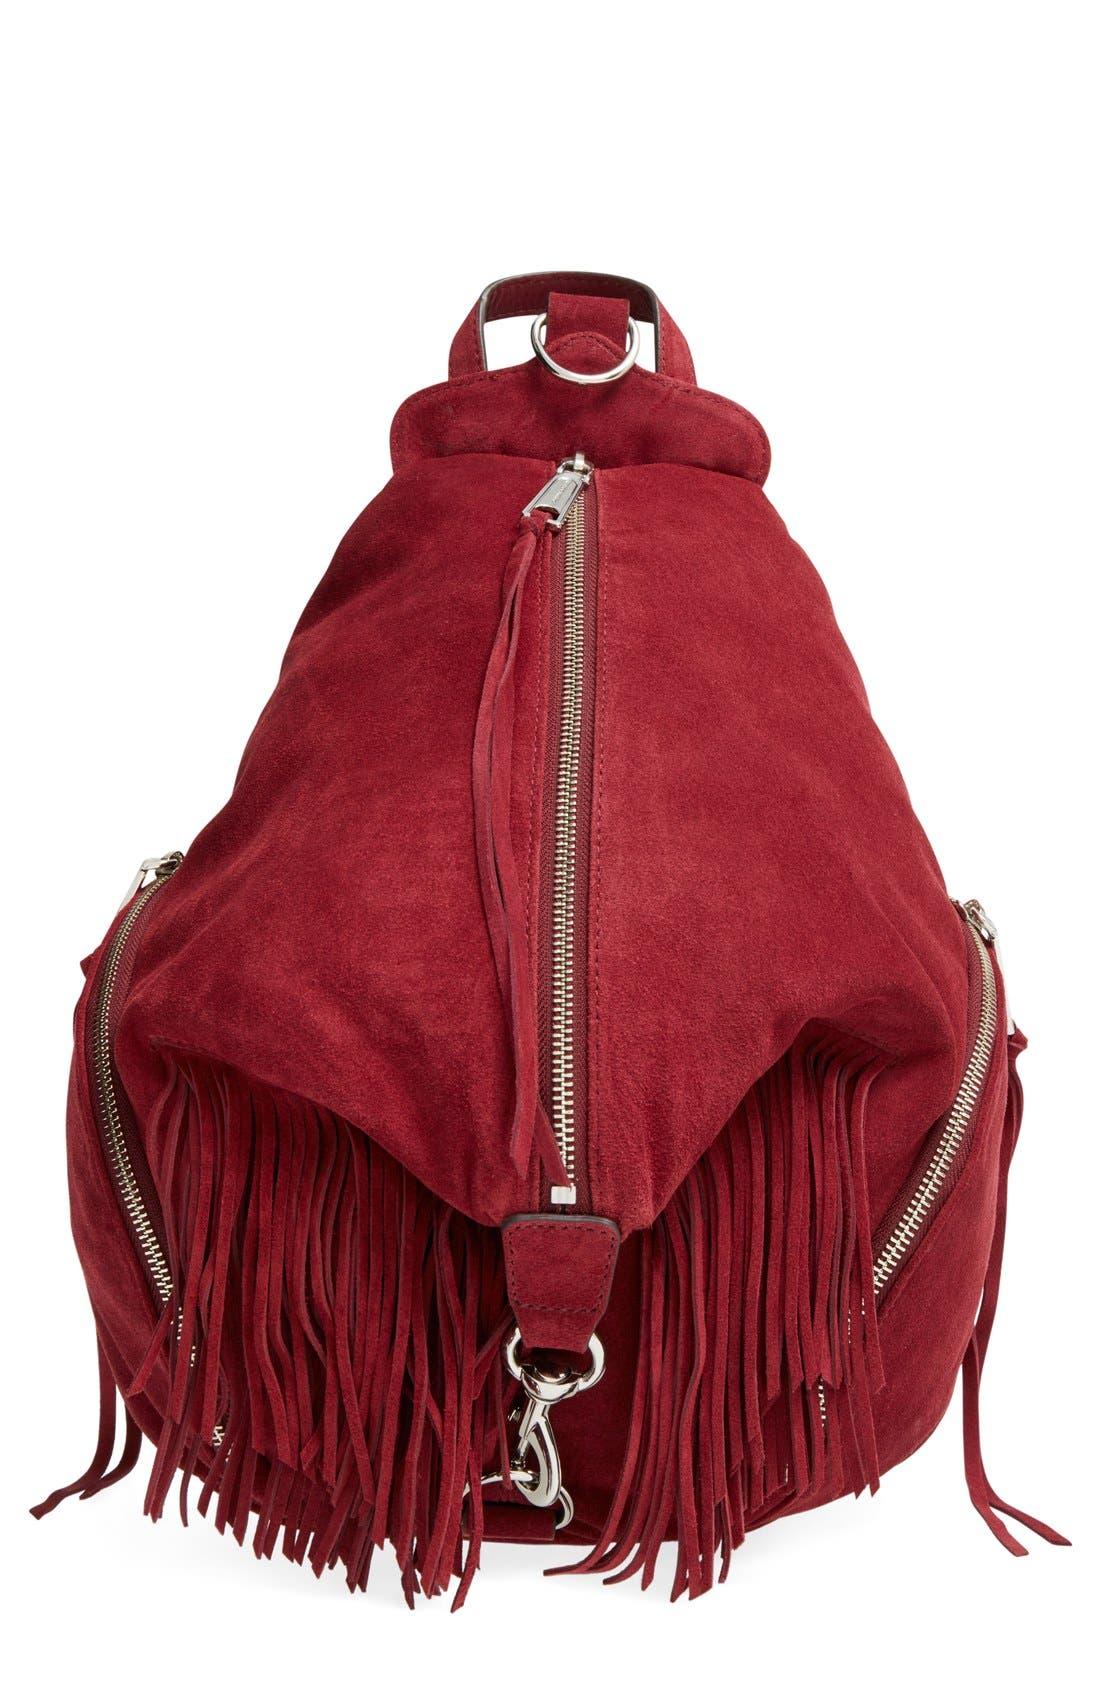 Alternate Image 1 Selected - Rebecca Minkoff 'Julian' Leather Backpack